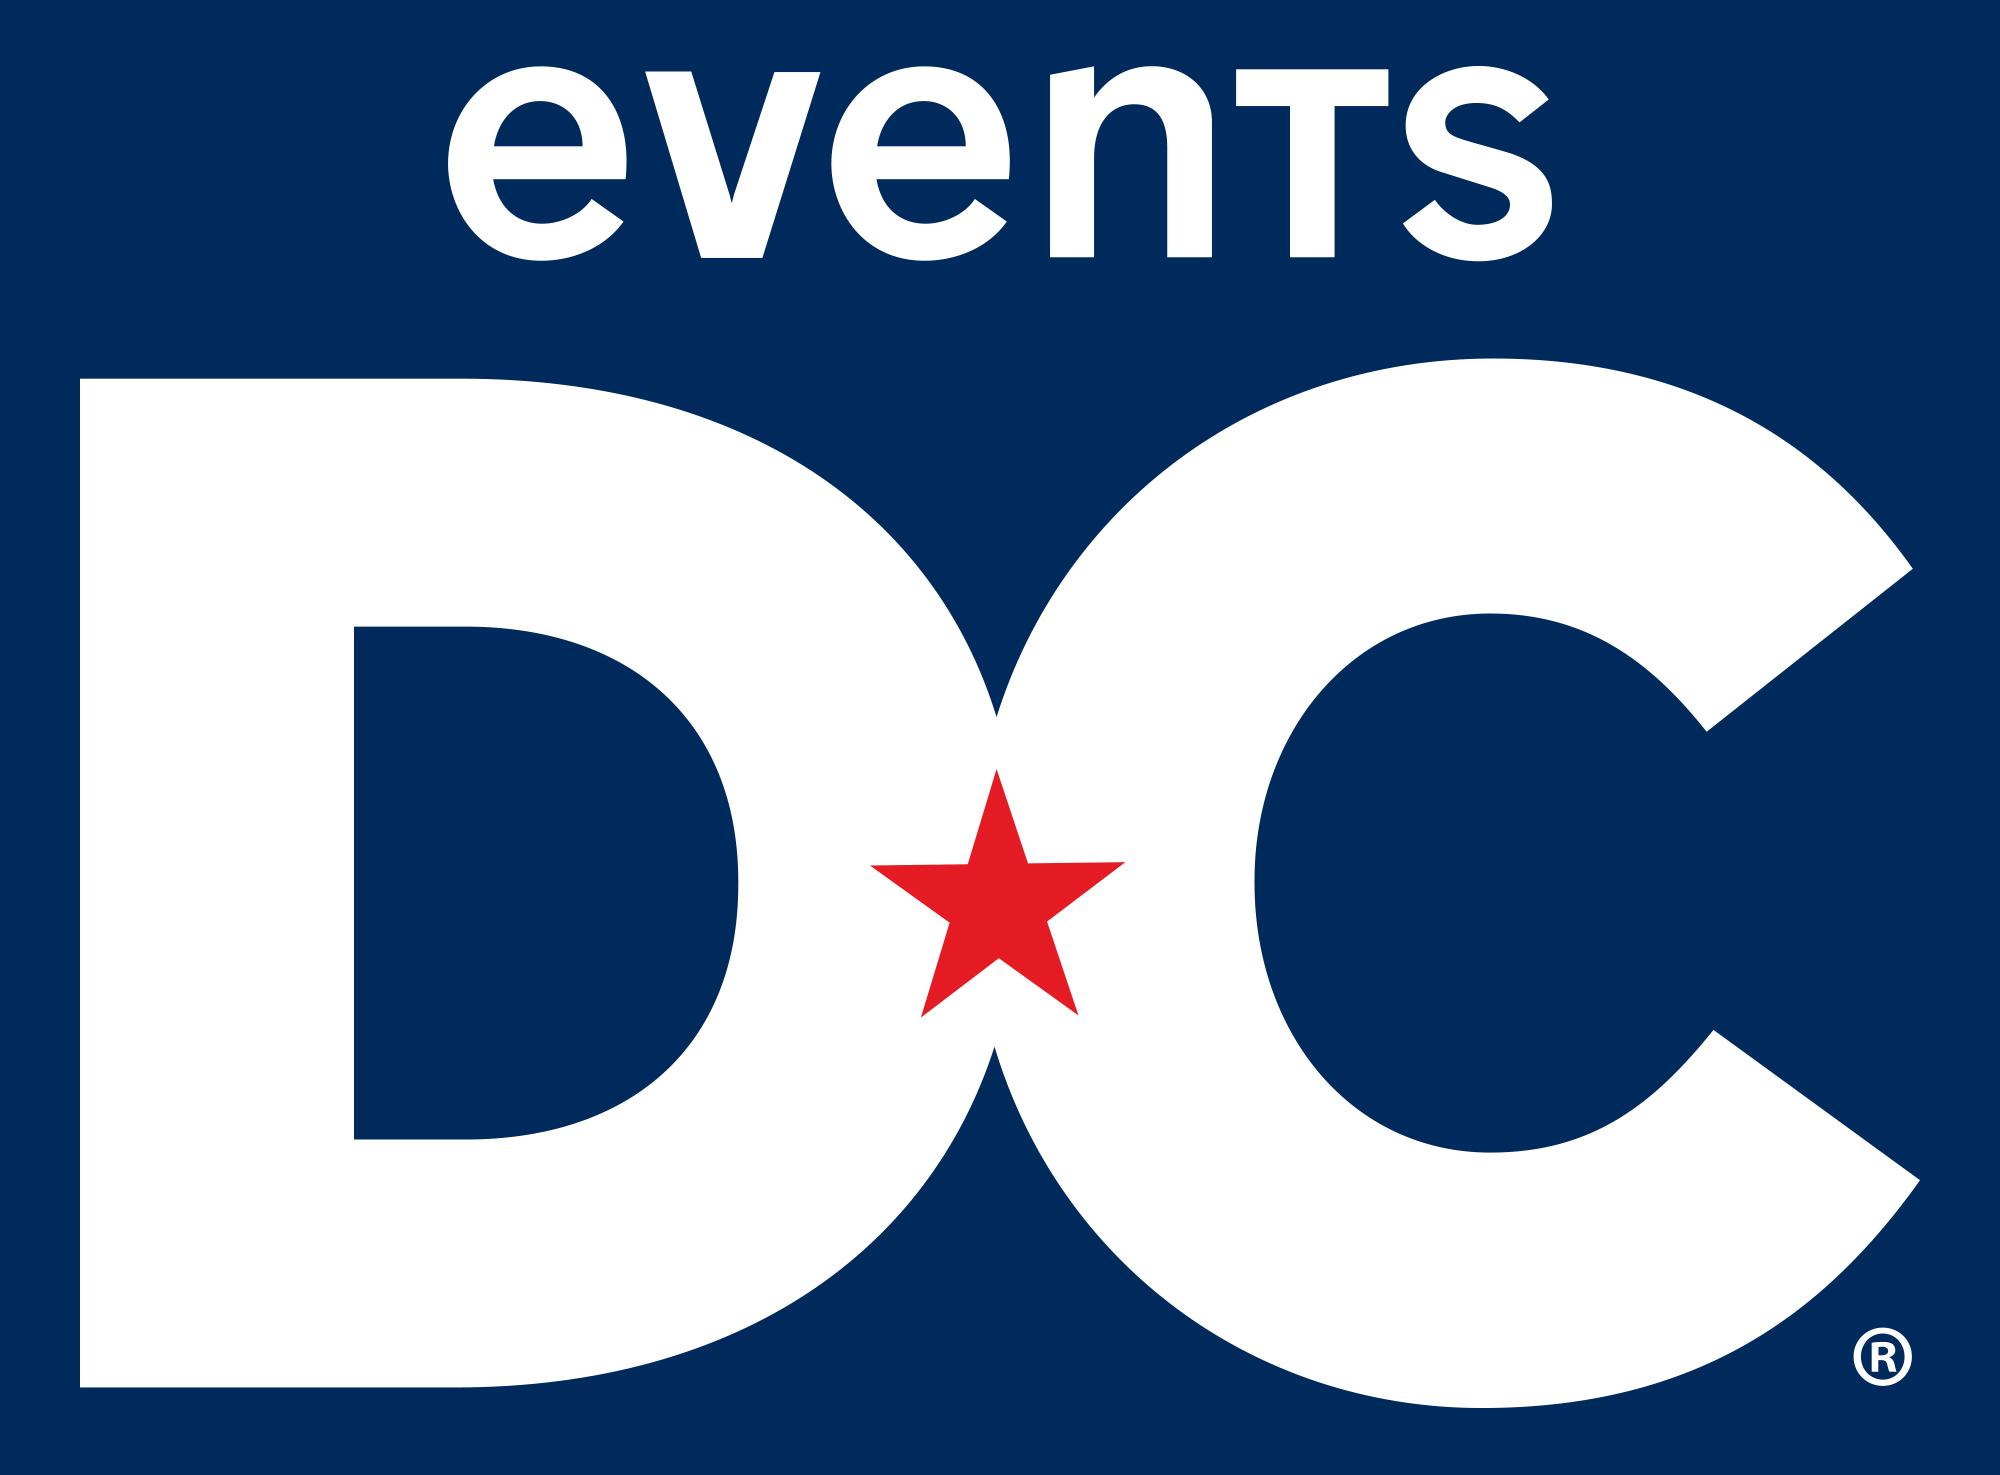 events_dc.jpg